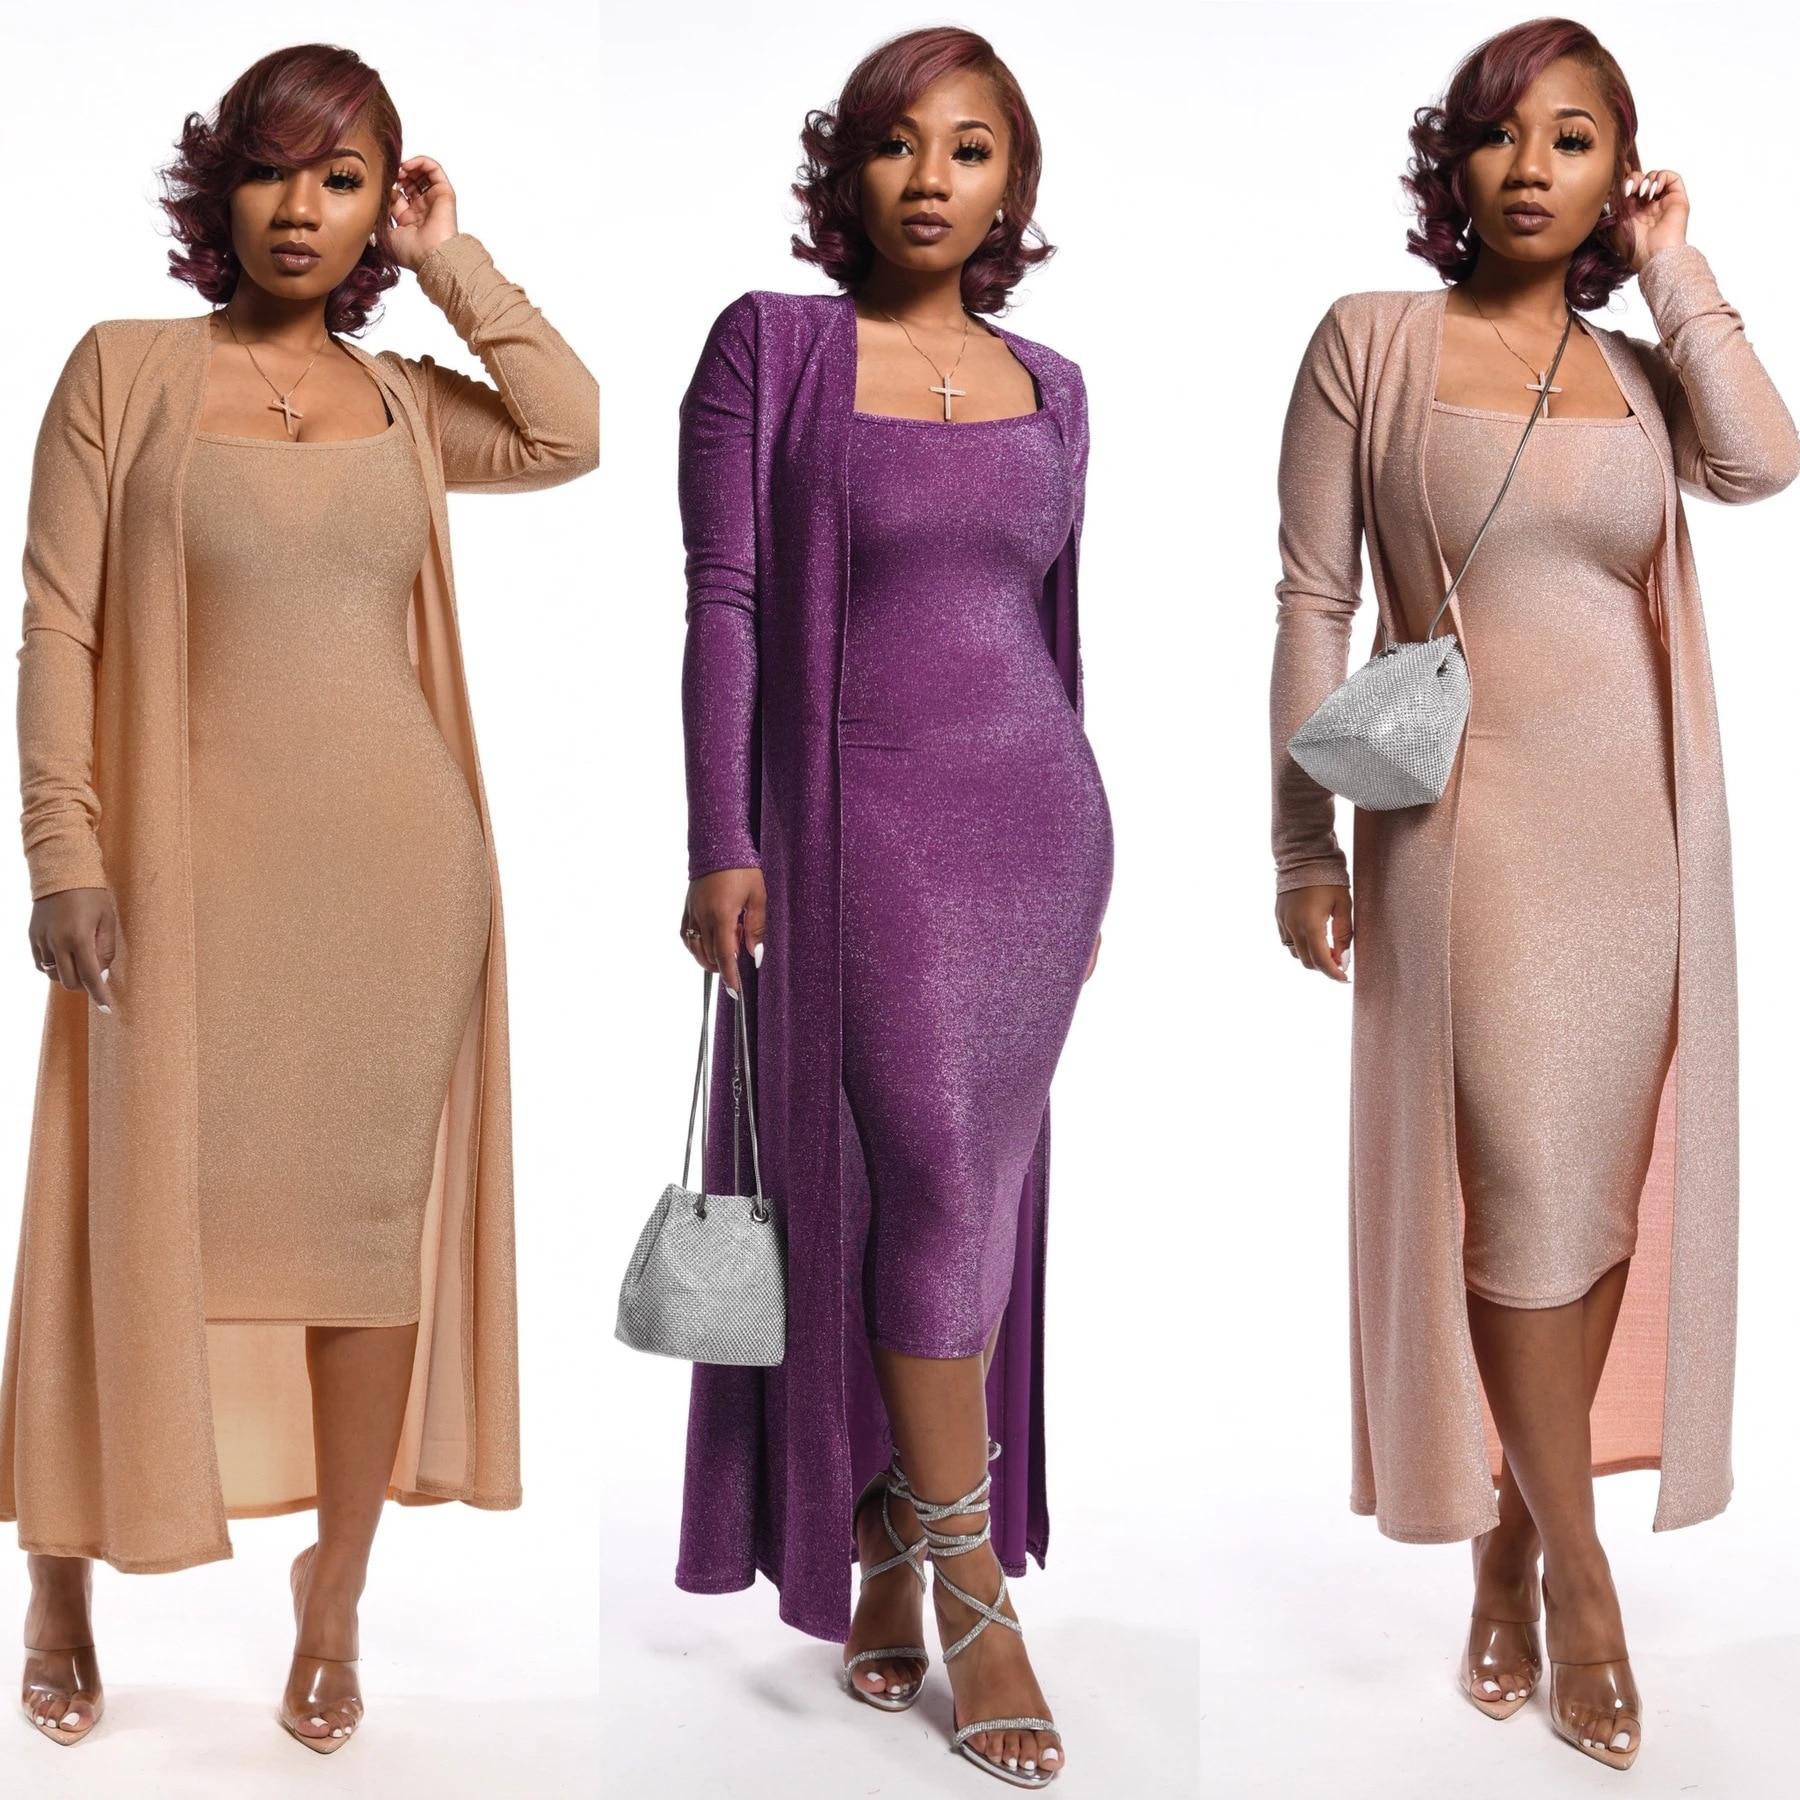 2 Piece Set Dress 2020 New African Fashion Long Coat Two Piece Bazin Suit Big Elastic For Lady